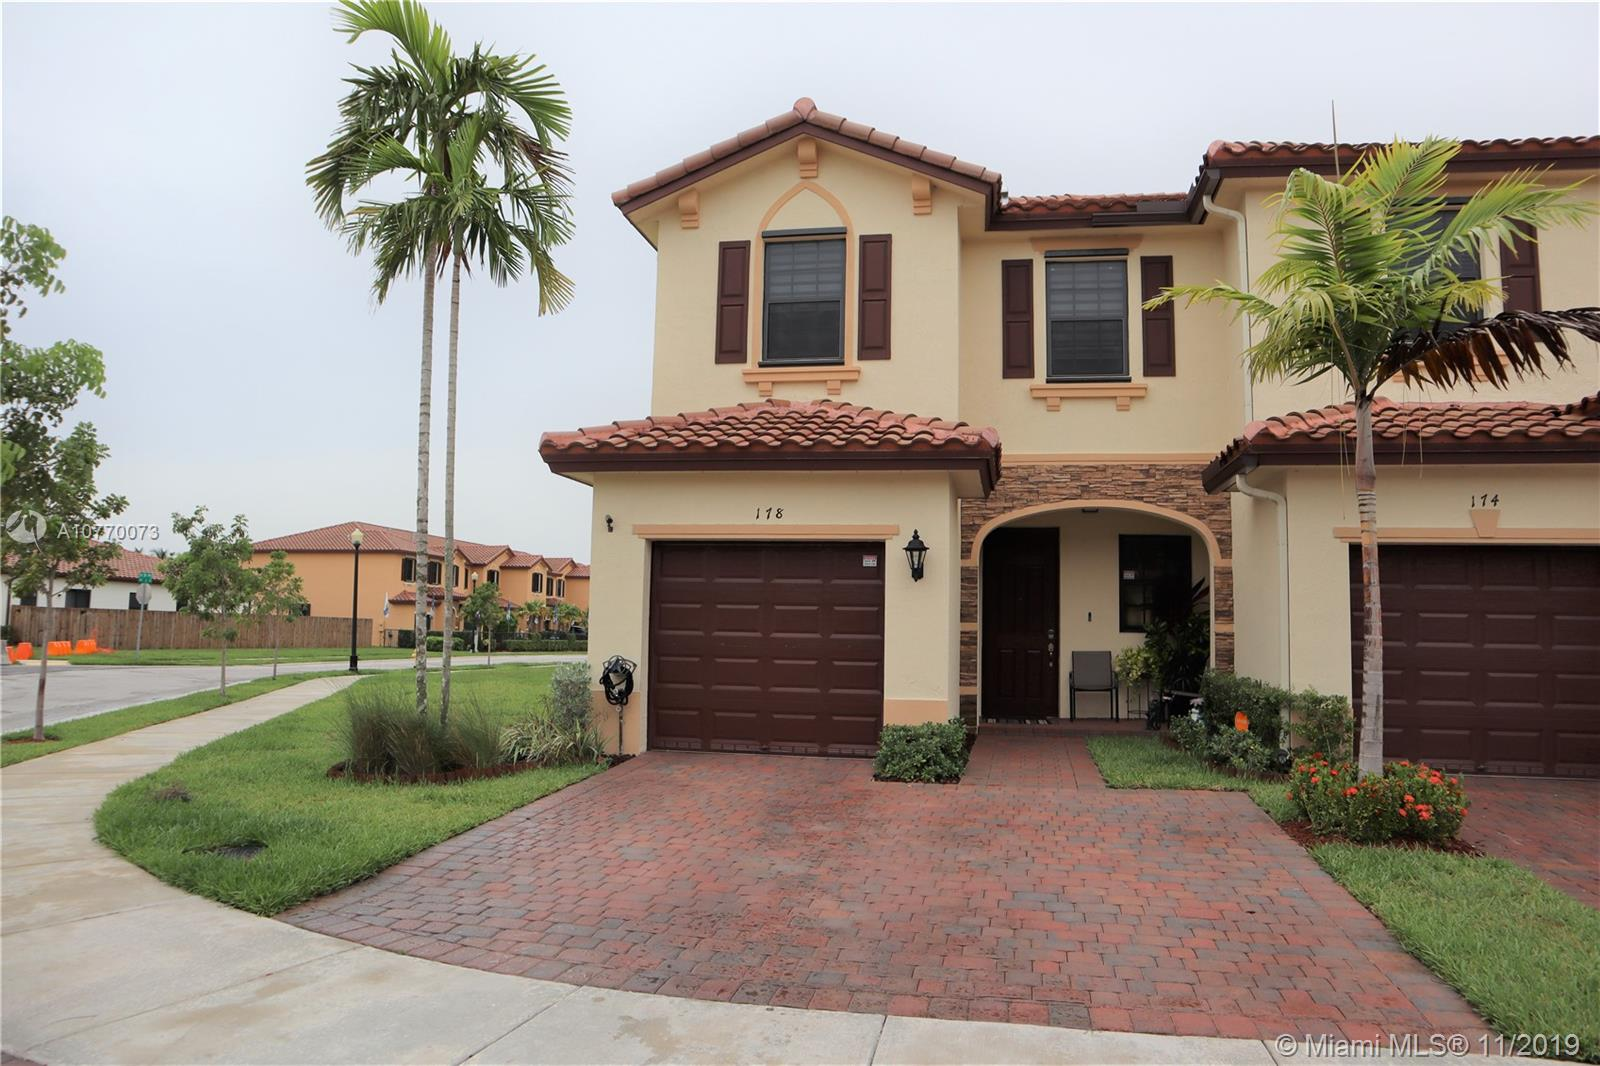 178 SE 34th Ter, Homestead, FL 33033 - Homestead, FL real estate listing